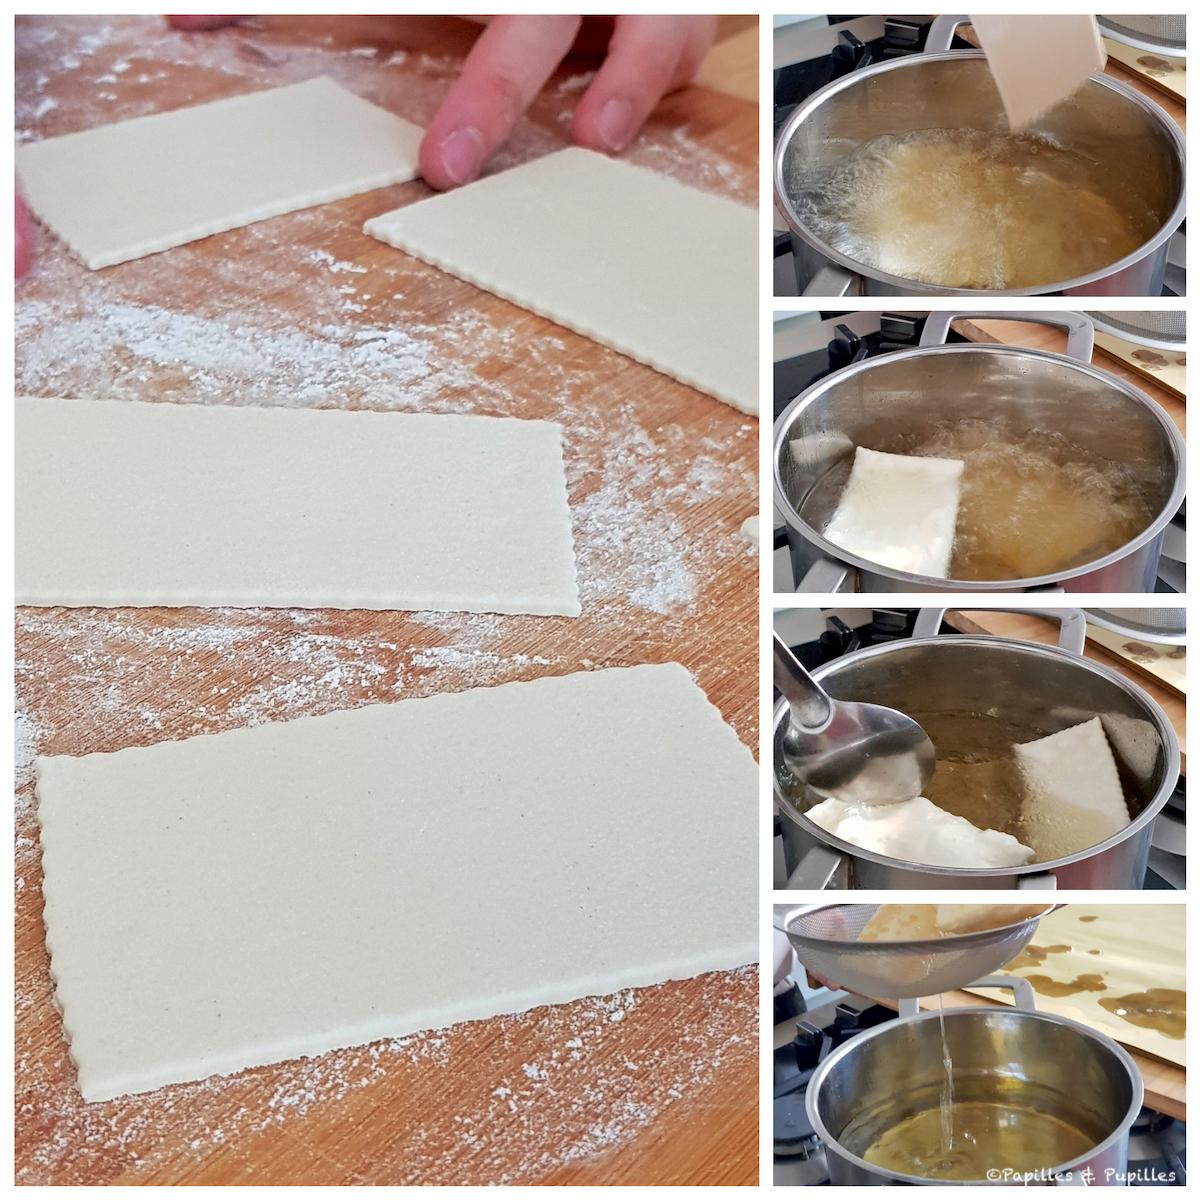 Préparation des gnocco fritto